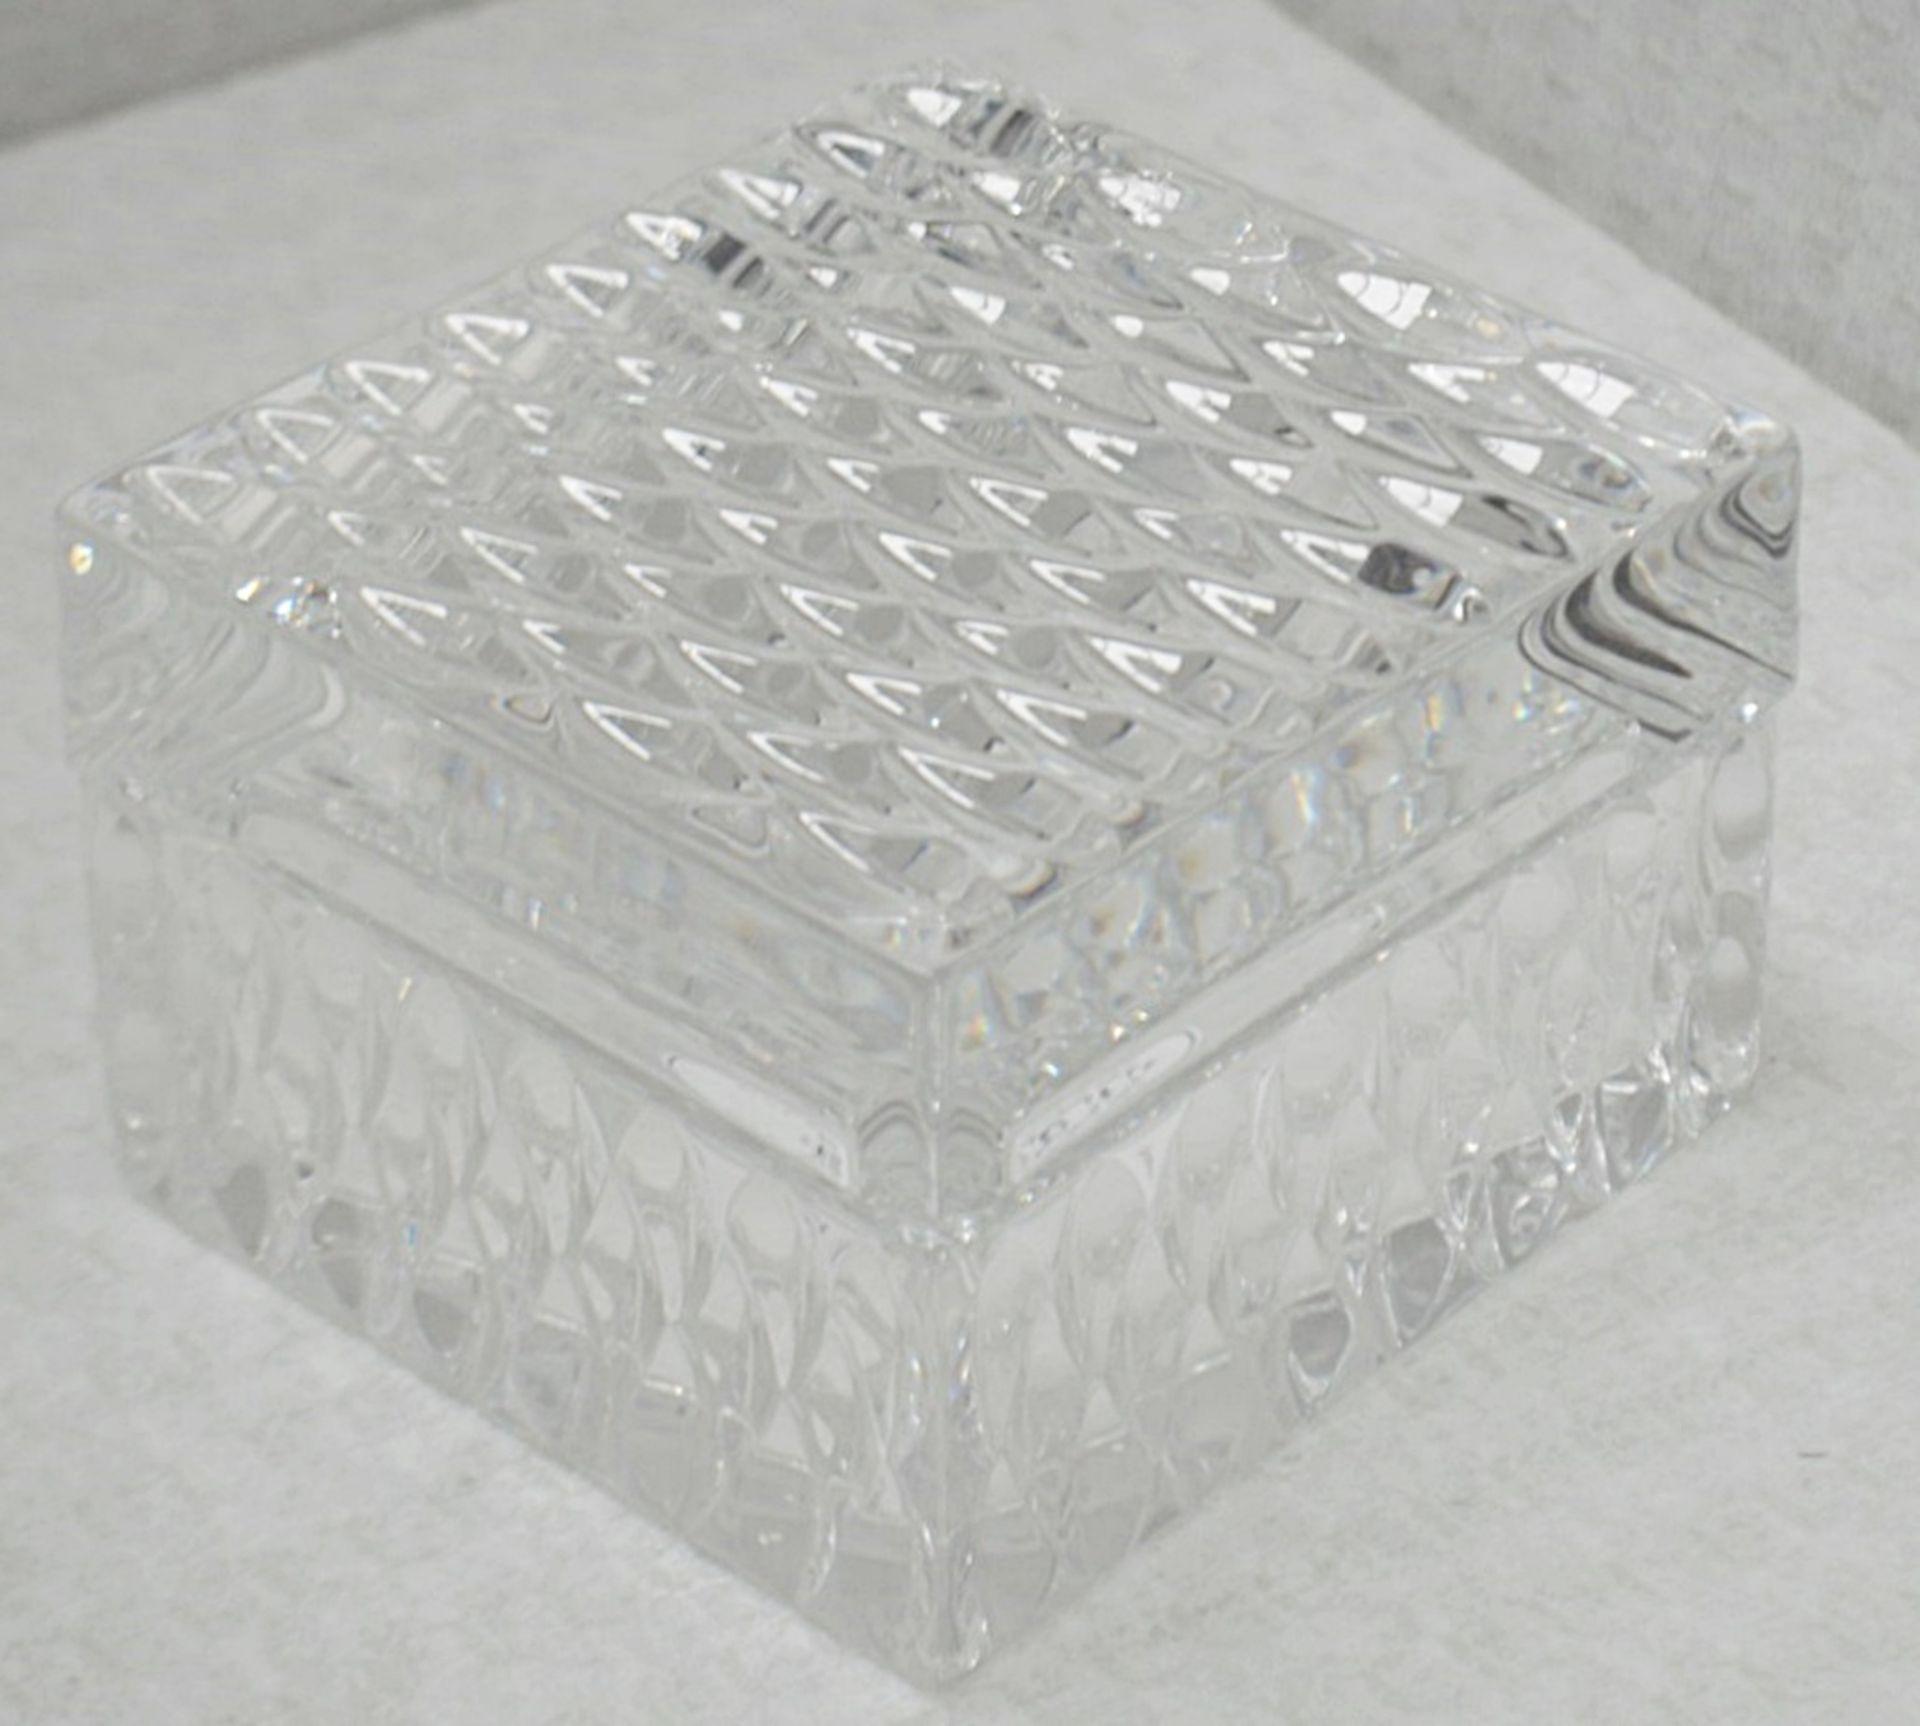 1 x BALDI 'Home Jewels' Italian Hand-crafted Artisan Clear Diamond Crystal Perfume Box, With A - Image 5 of 5